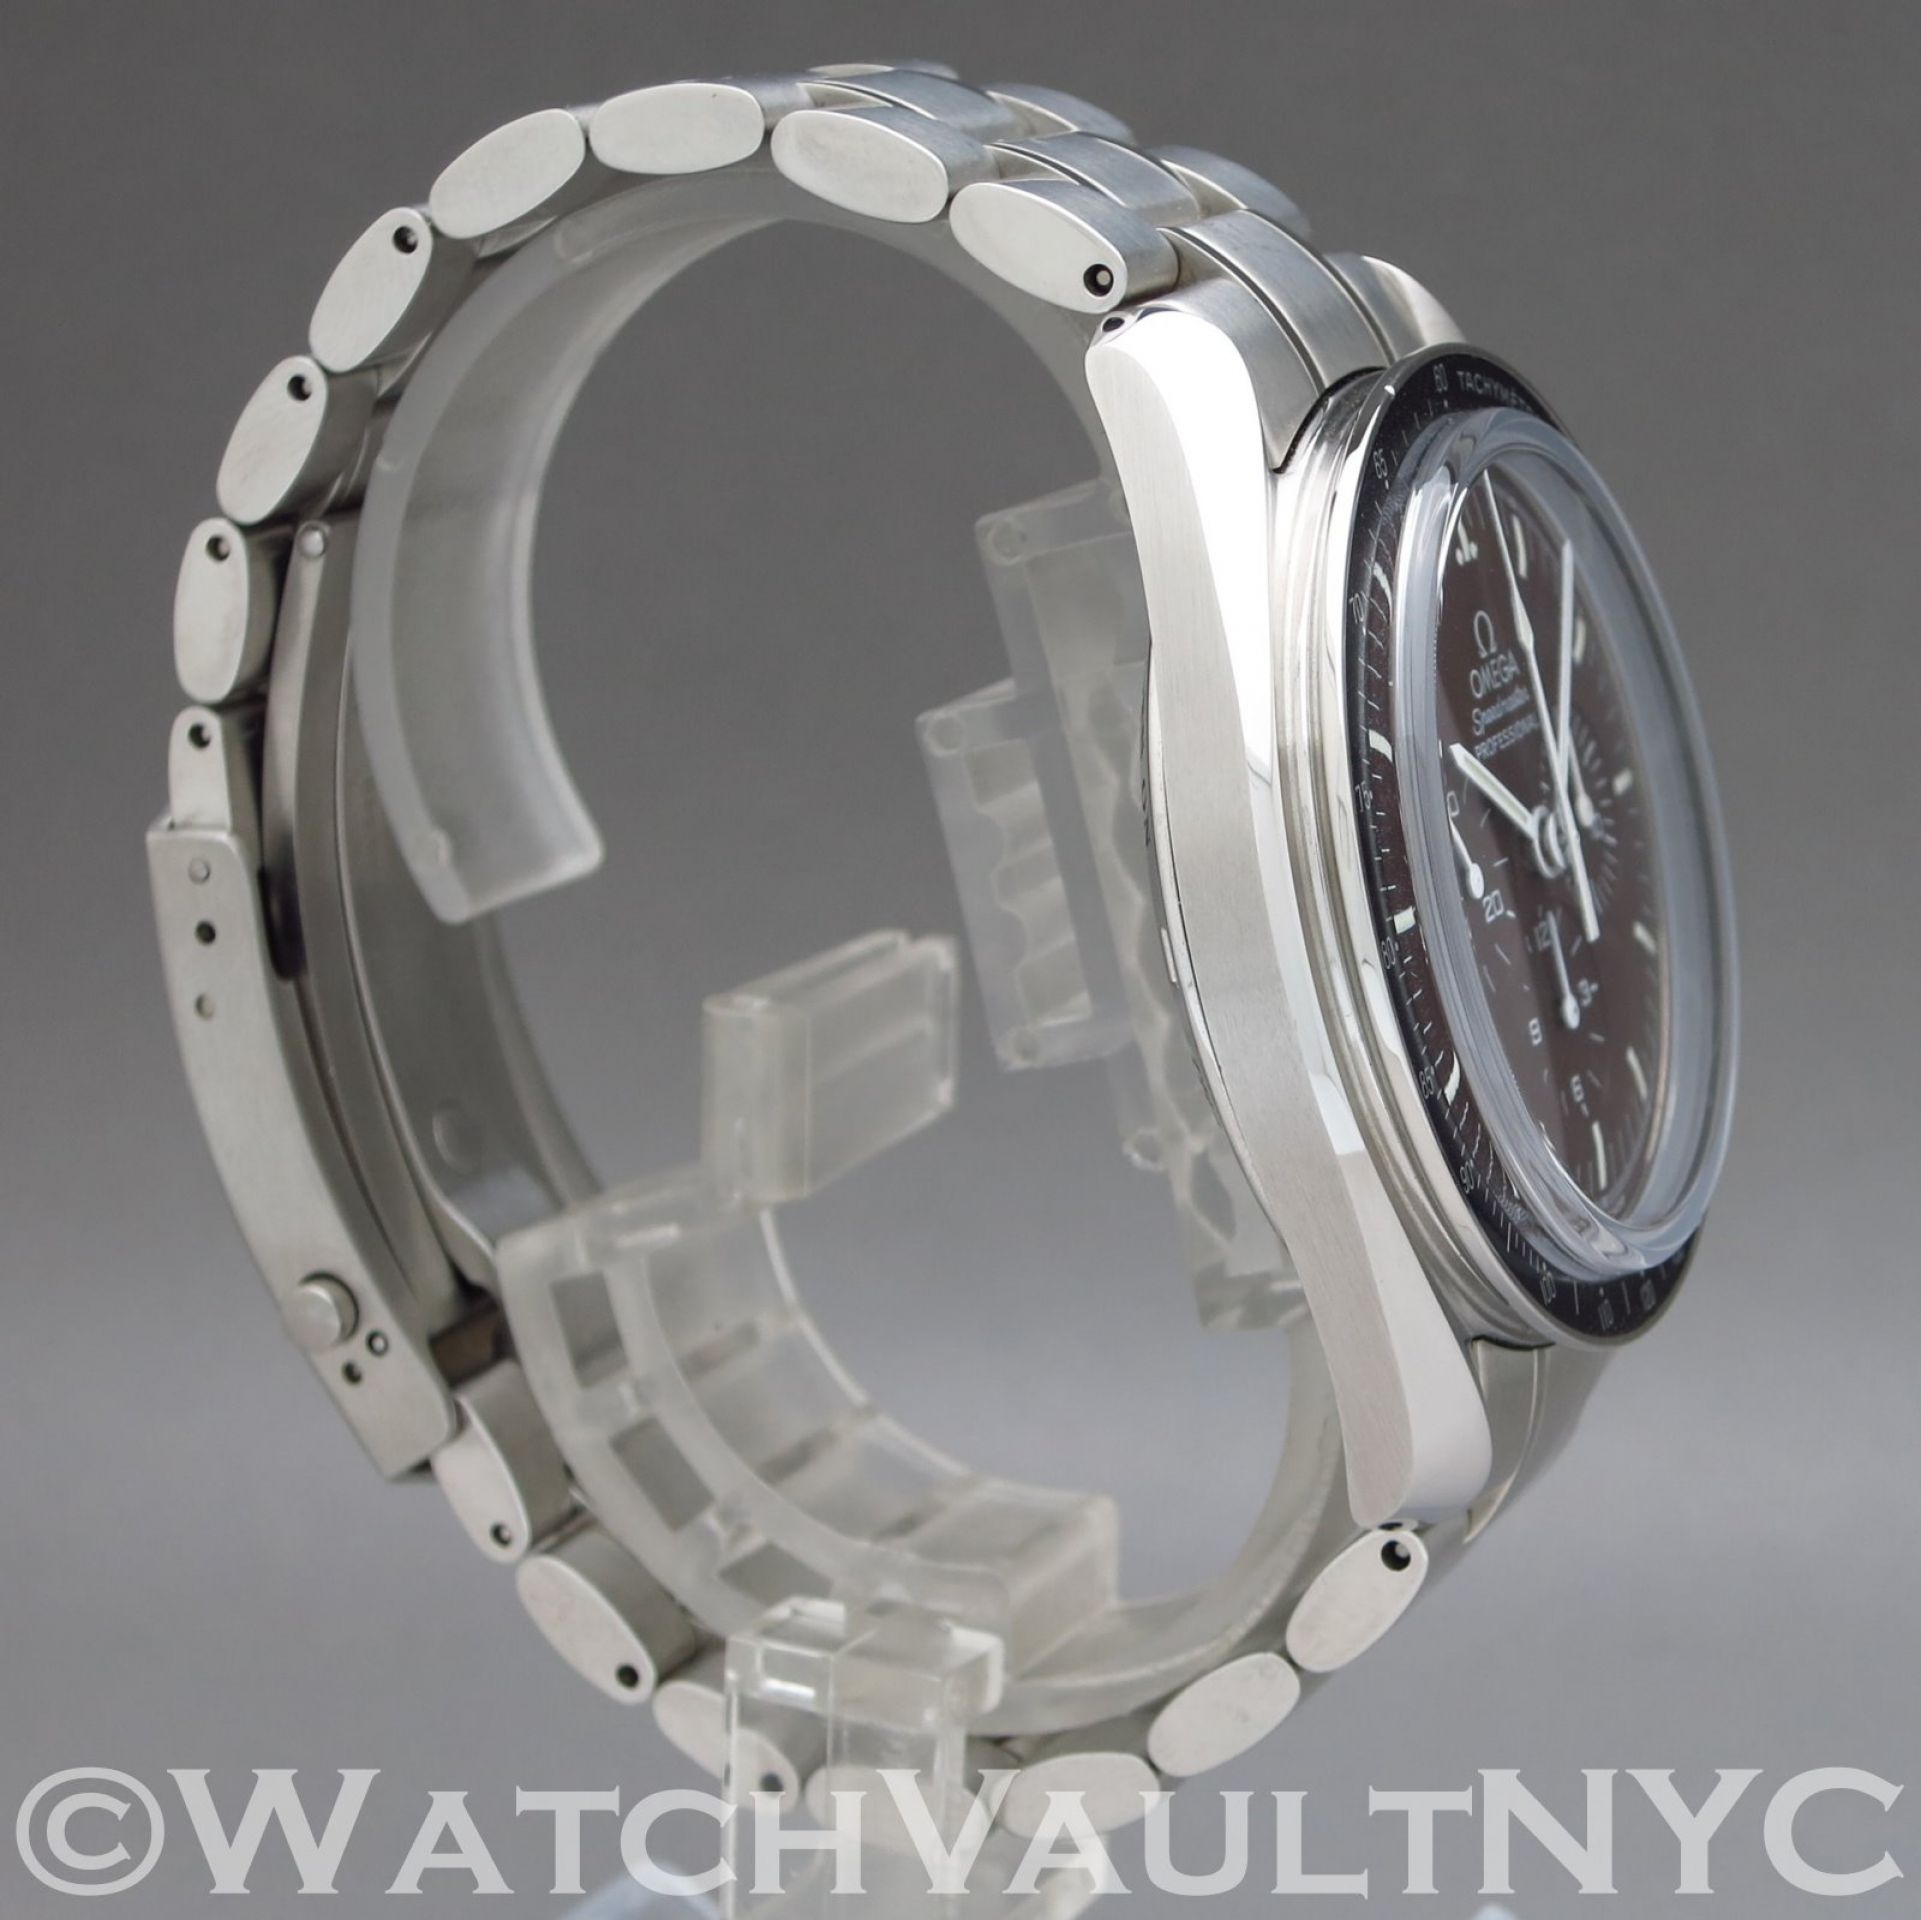 Omega Speedmaster Professional Moonwatch 311.30.42.30.13.001 RG111